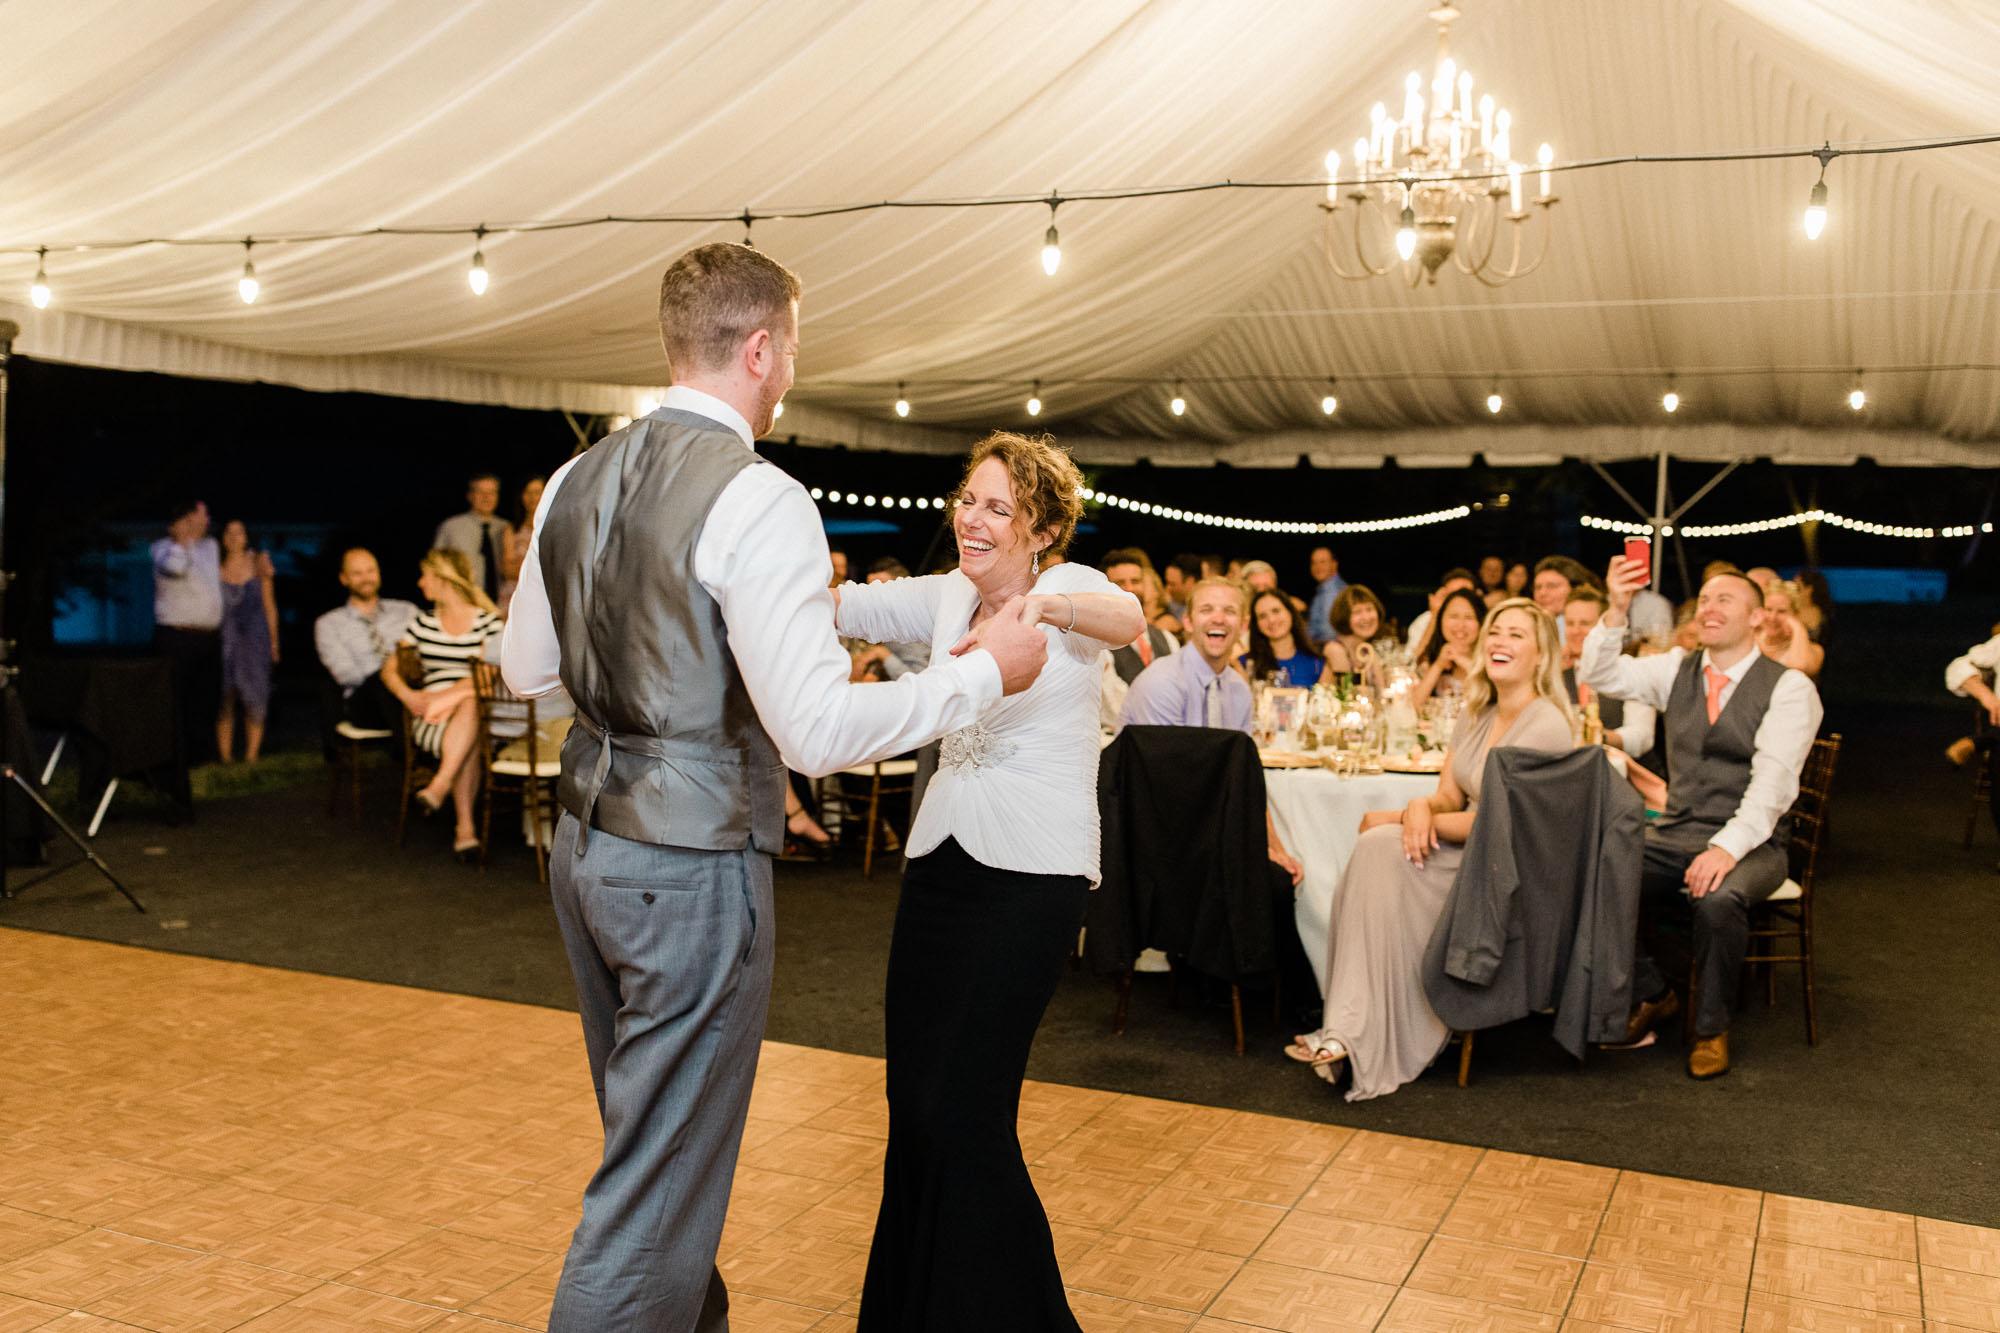 Allenberry-resort-historic-pennsylvania-wedding-10700.jpg